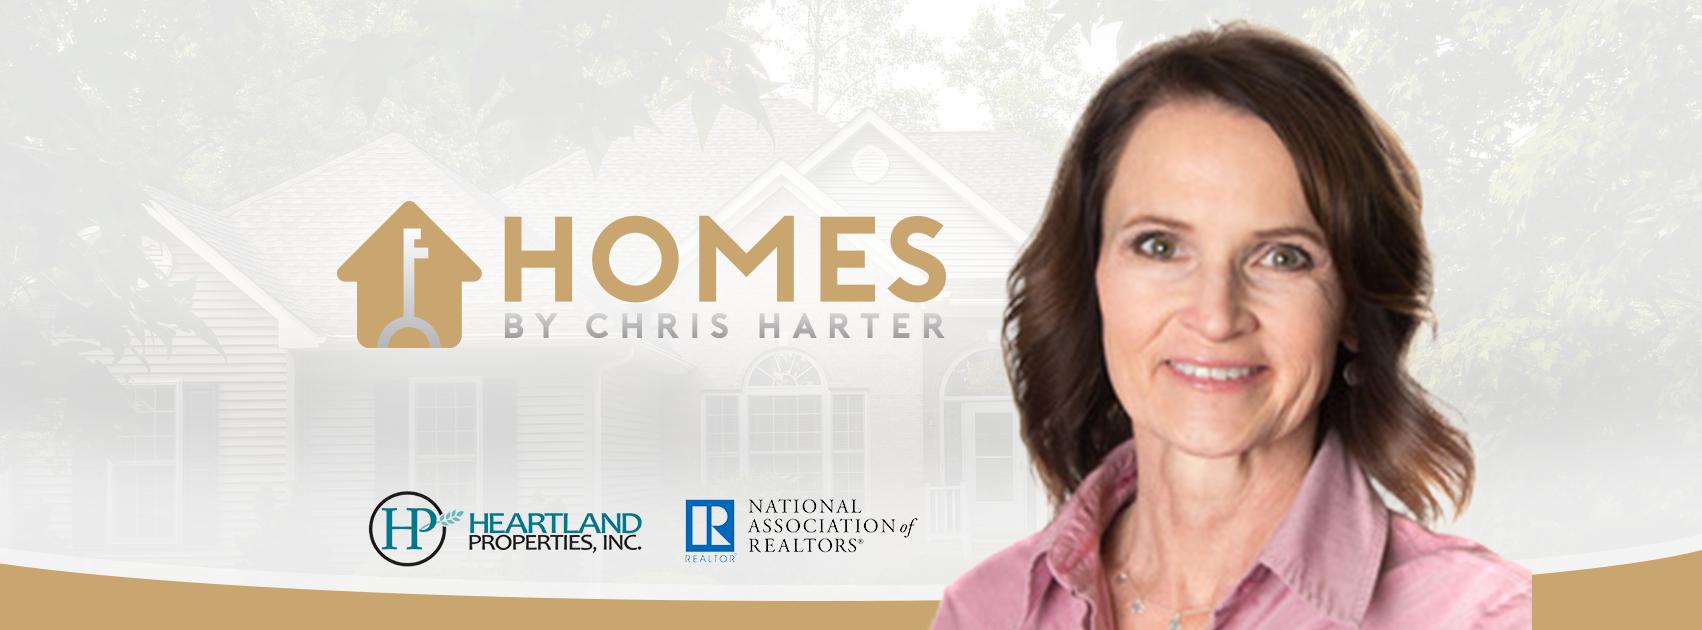 Homes By Chris Harter logo